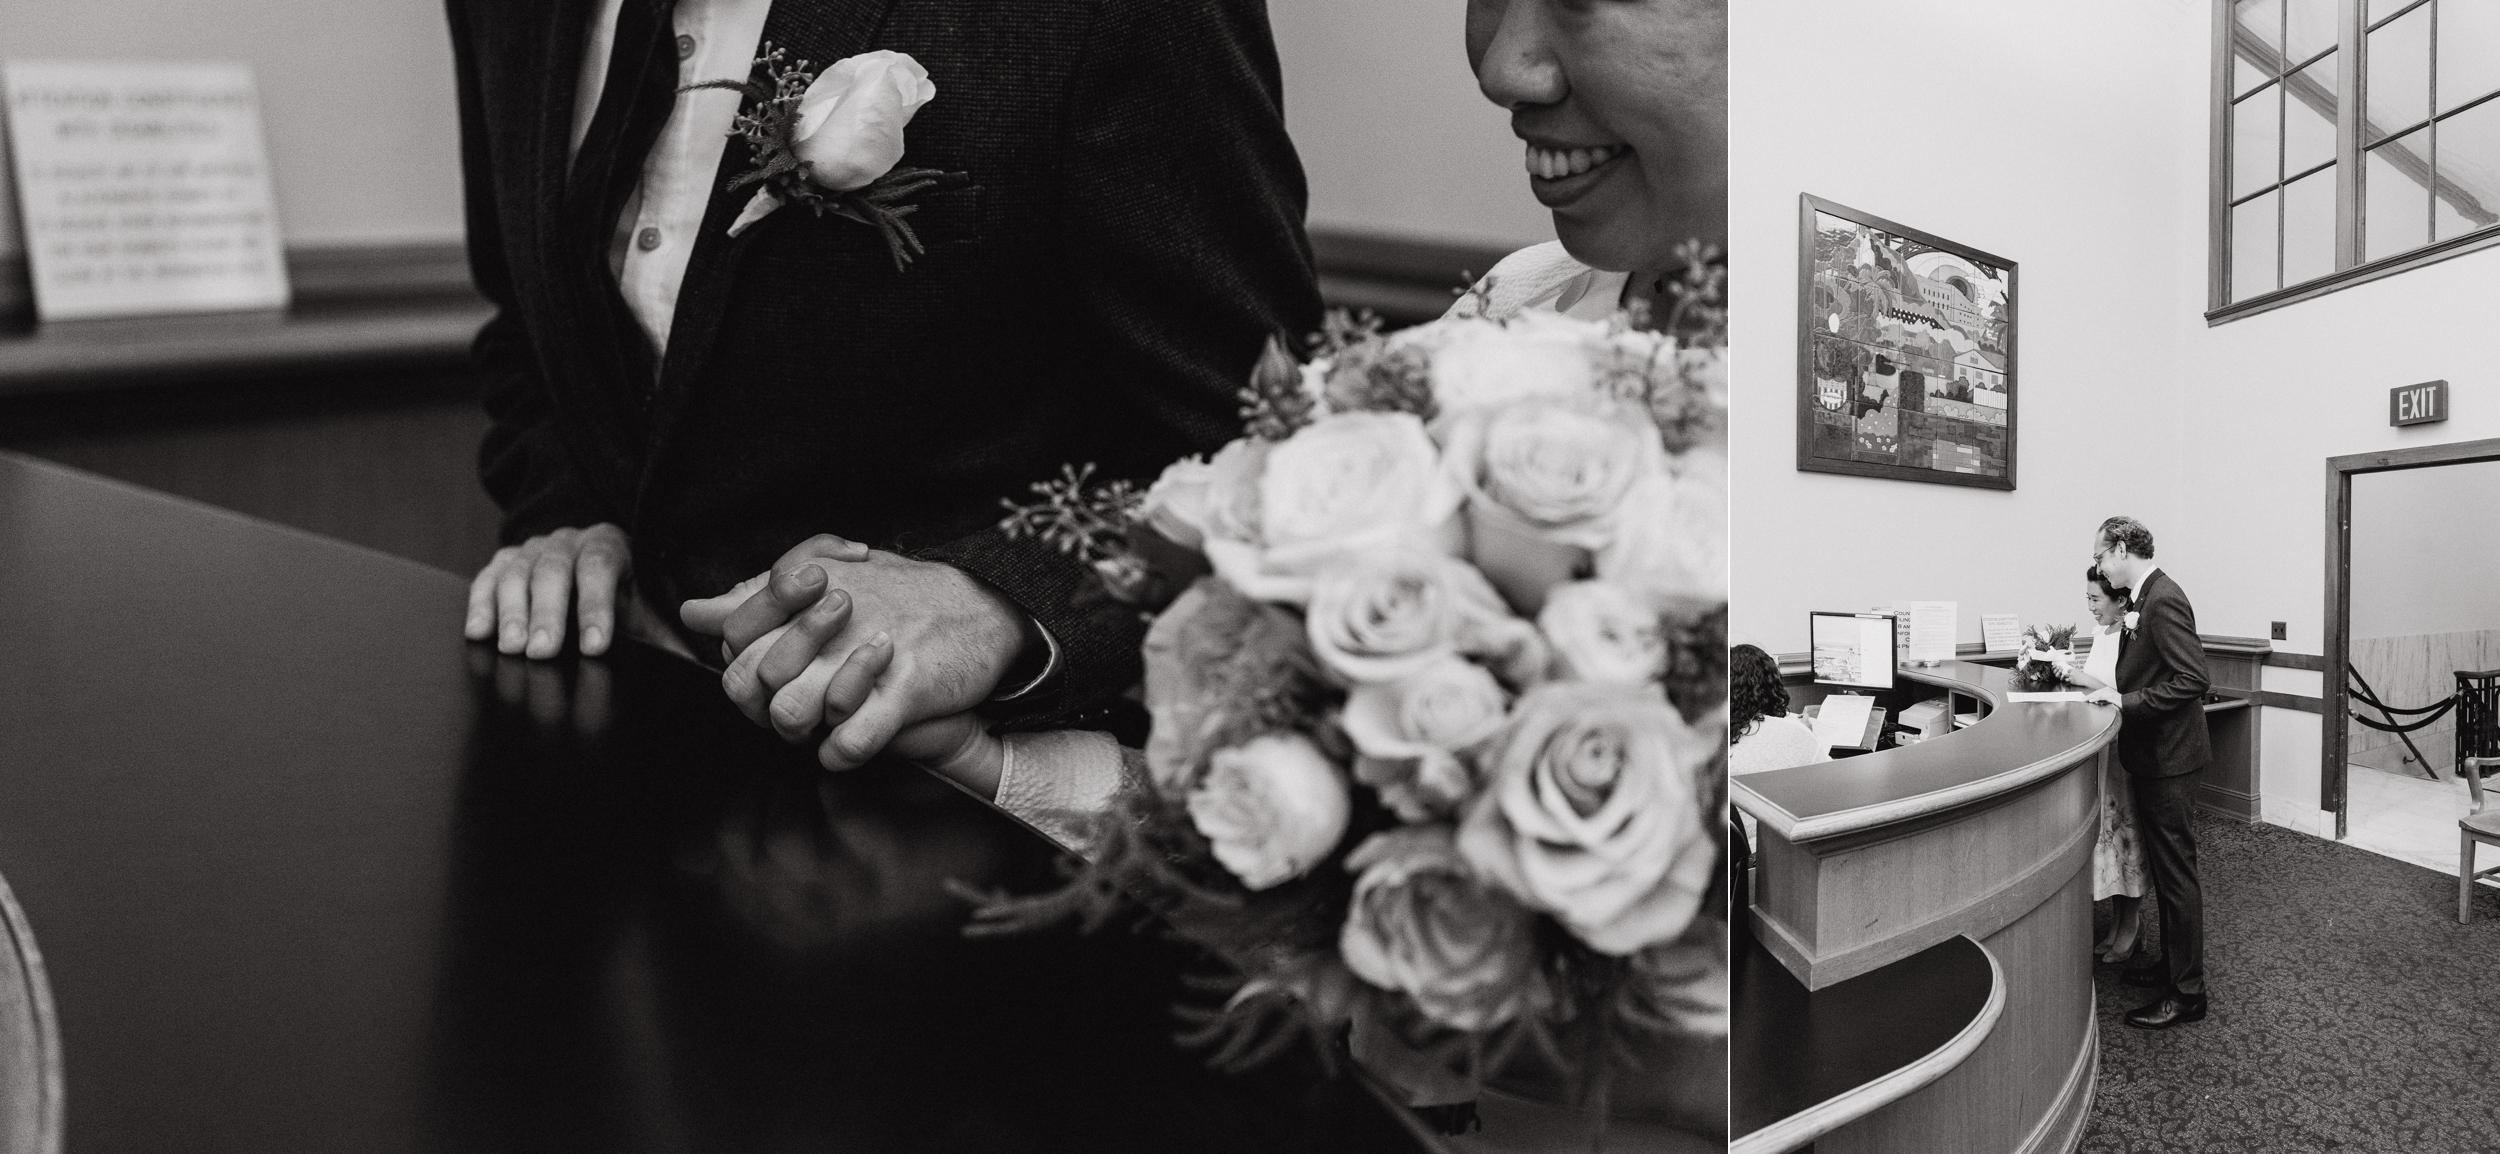 04-sf-city-hall-18-reasons-intimate-wedding-vivianchen-059_WEB.jpg